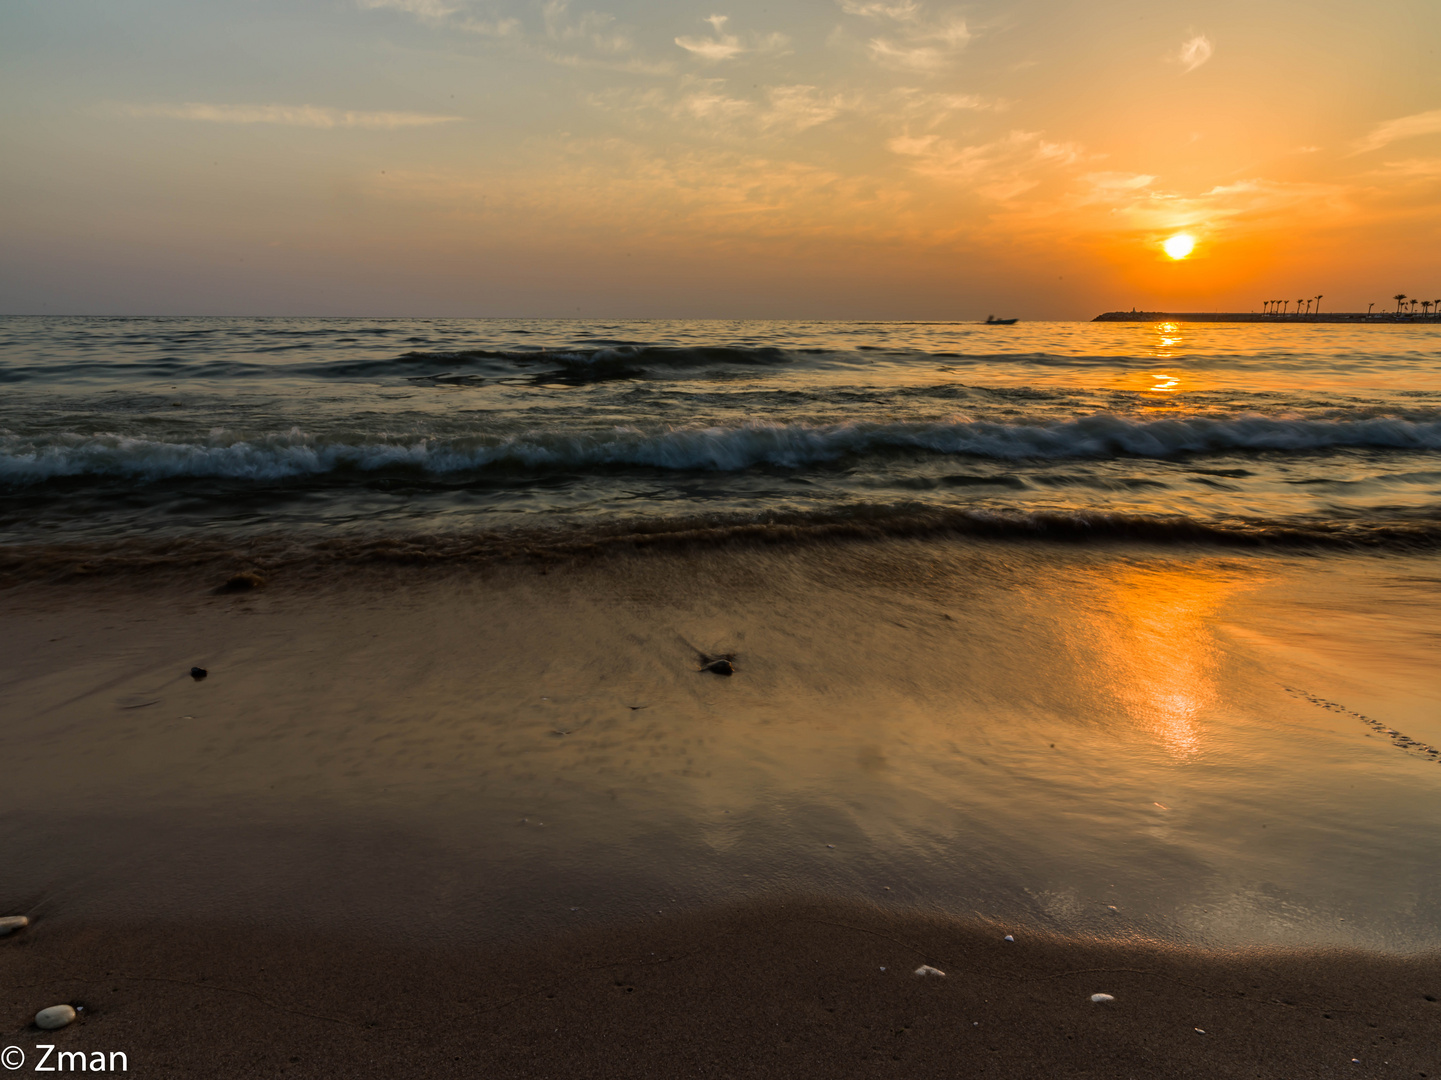 Sunset, Sea and Sand  B0002284-16